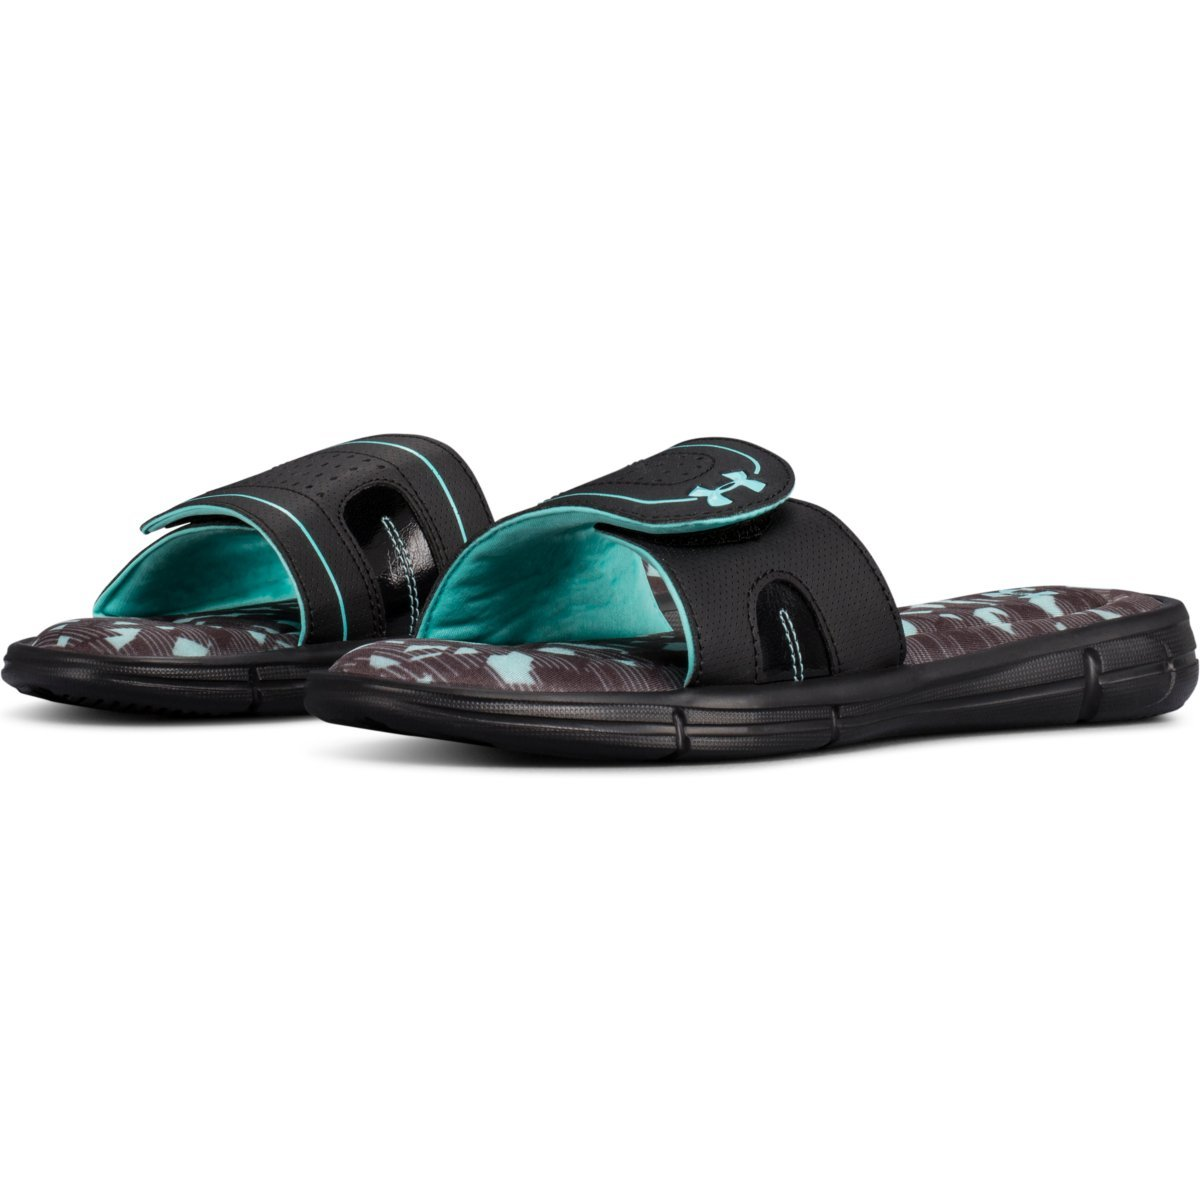 6544f4e6 UNDER ARMOUR Women's Ignite VIII Edge Slide Sandals - Bob's Stores